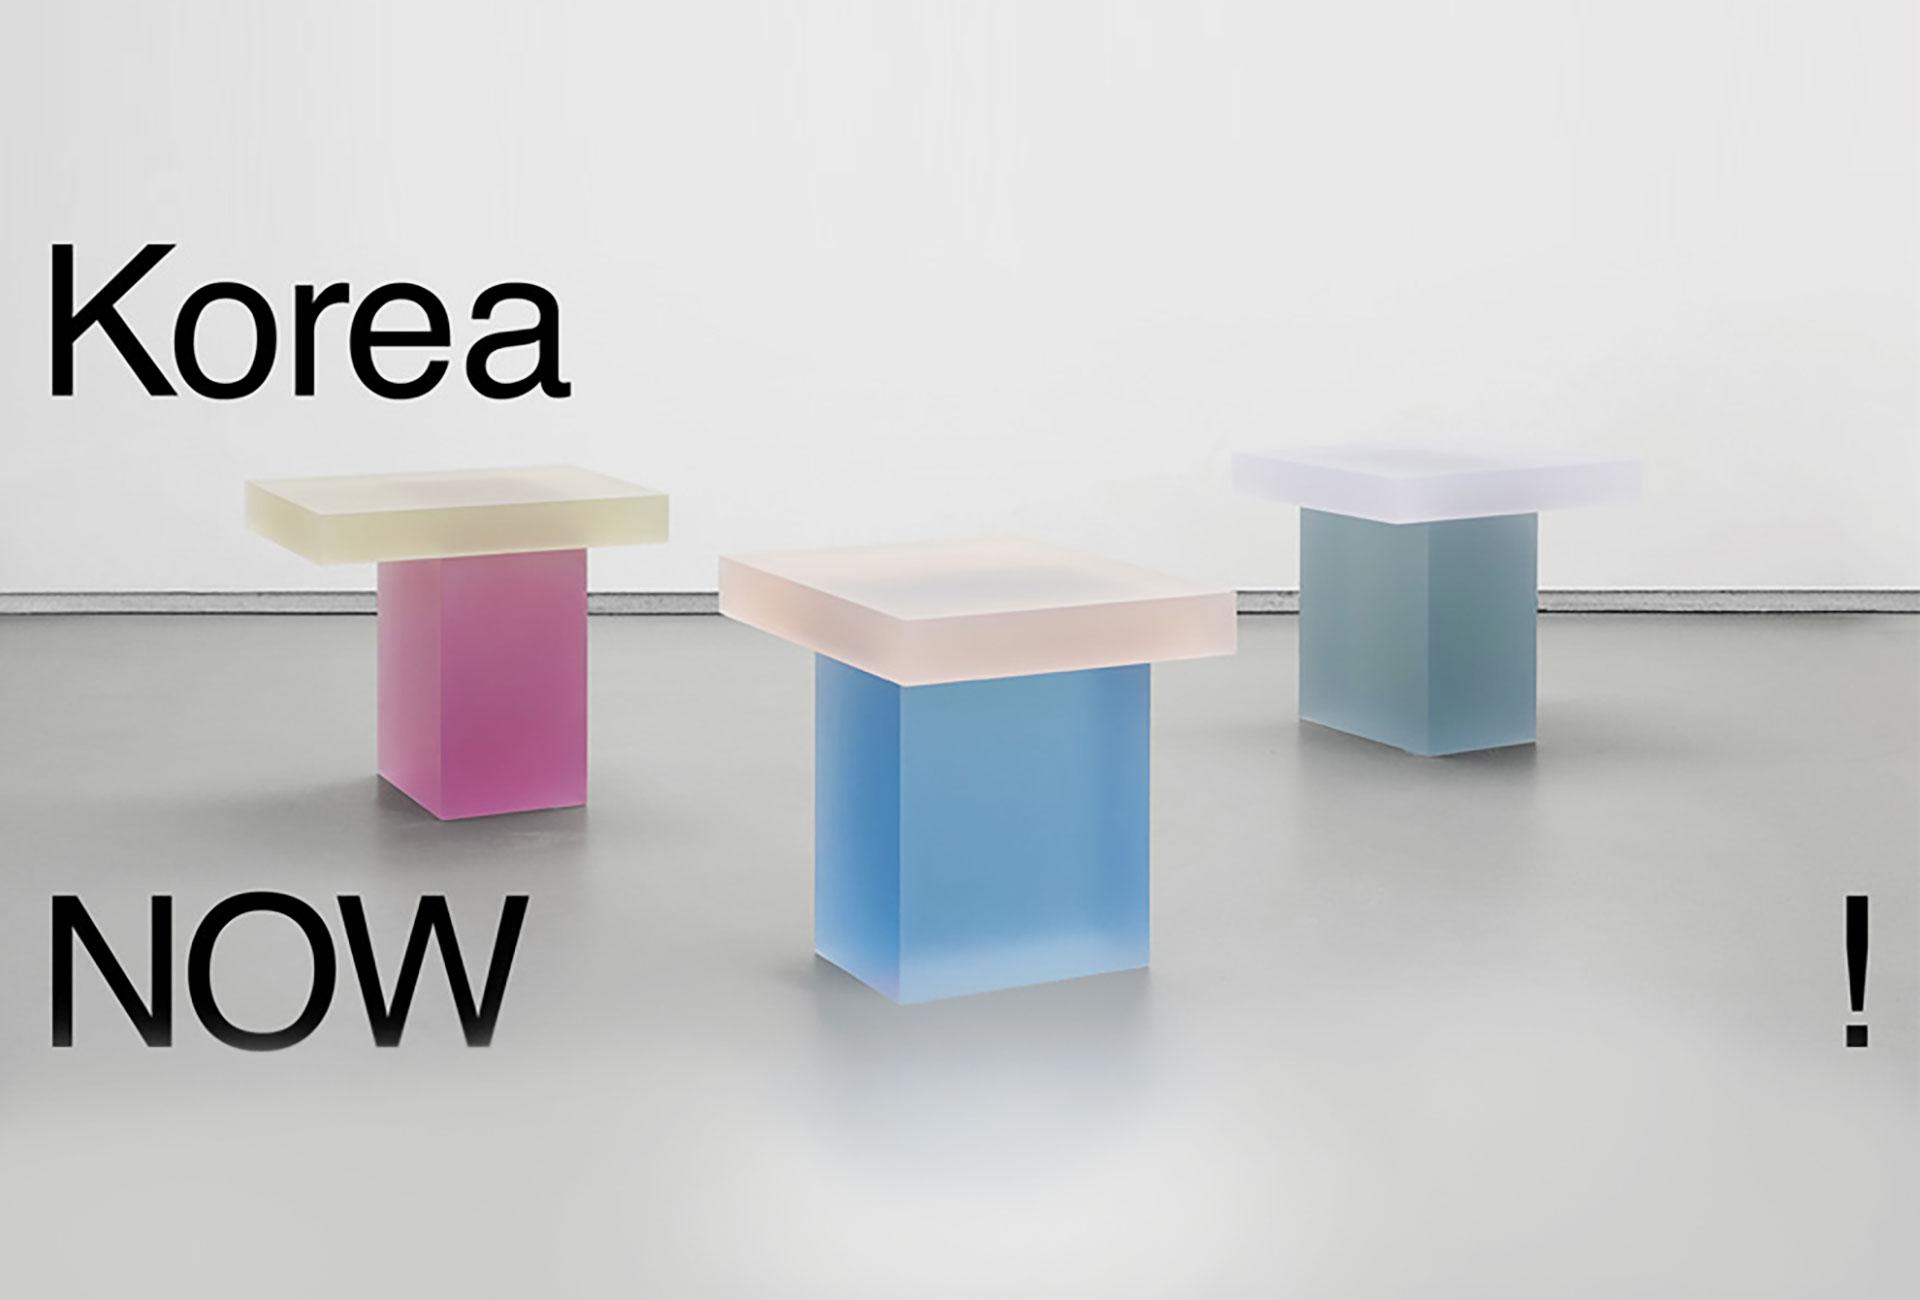 korea now bayerisches nationalmuseum art aurea. Black Bedroom Furniture Sets. Home Design Ideas